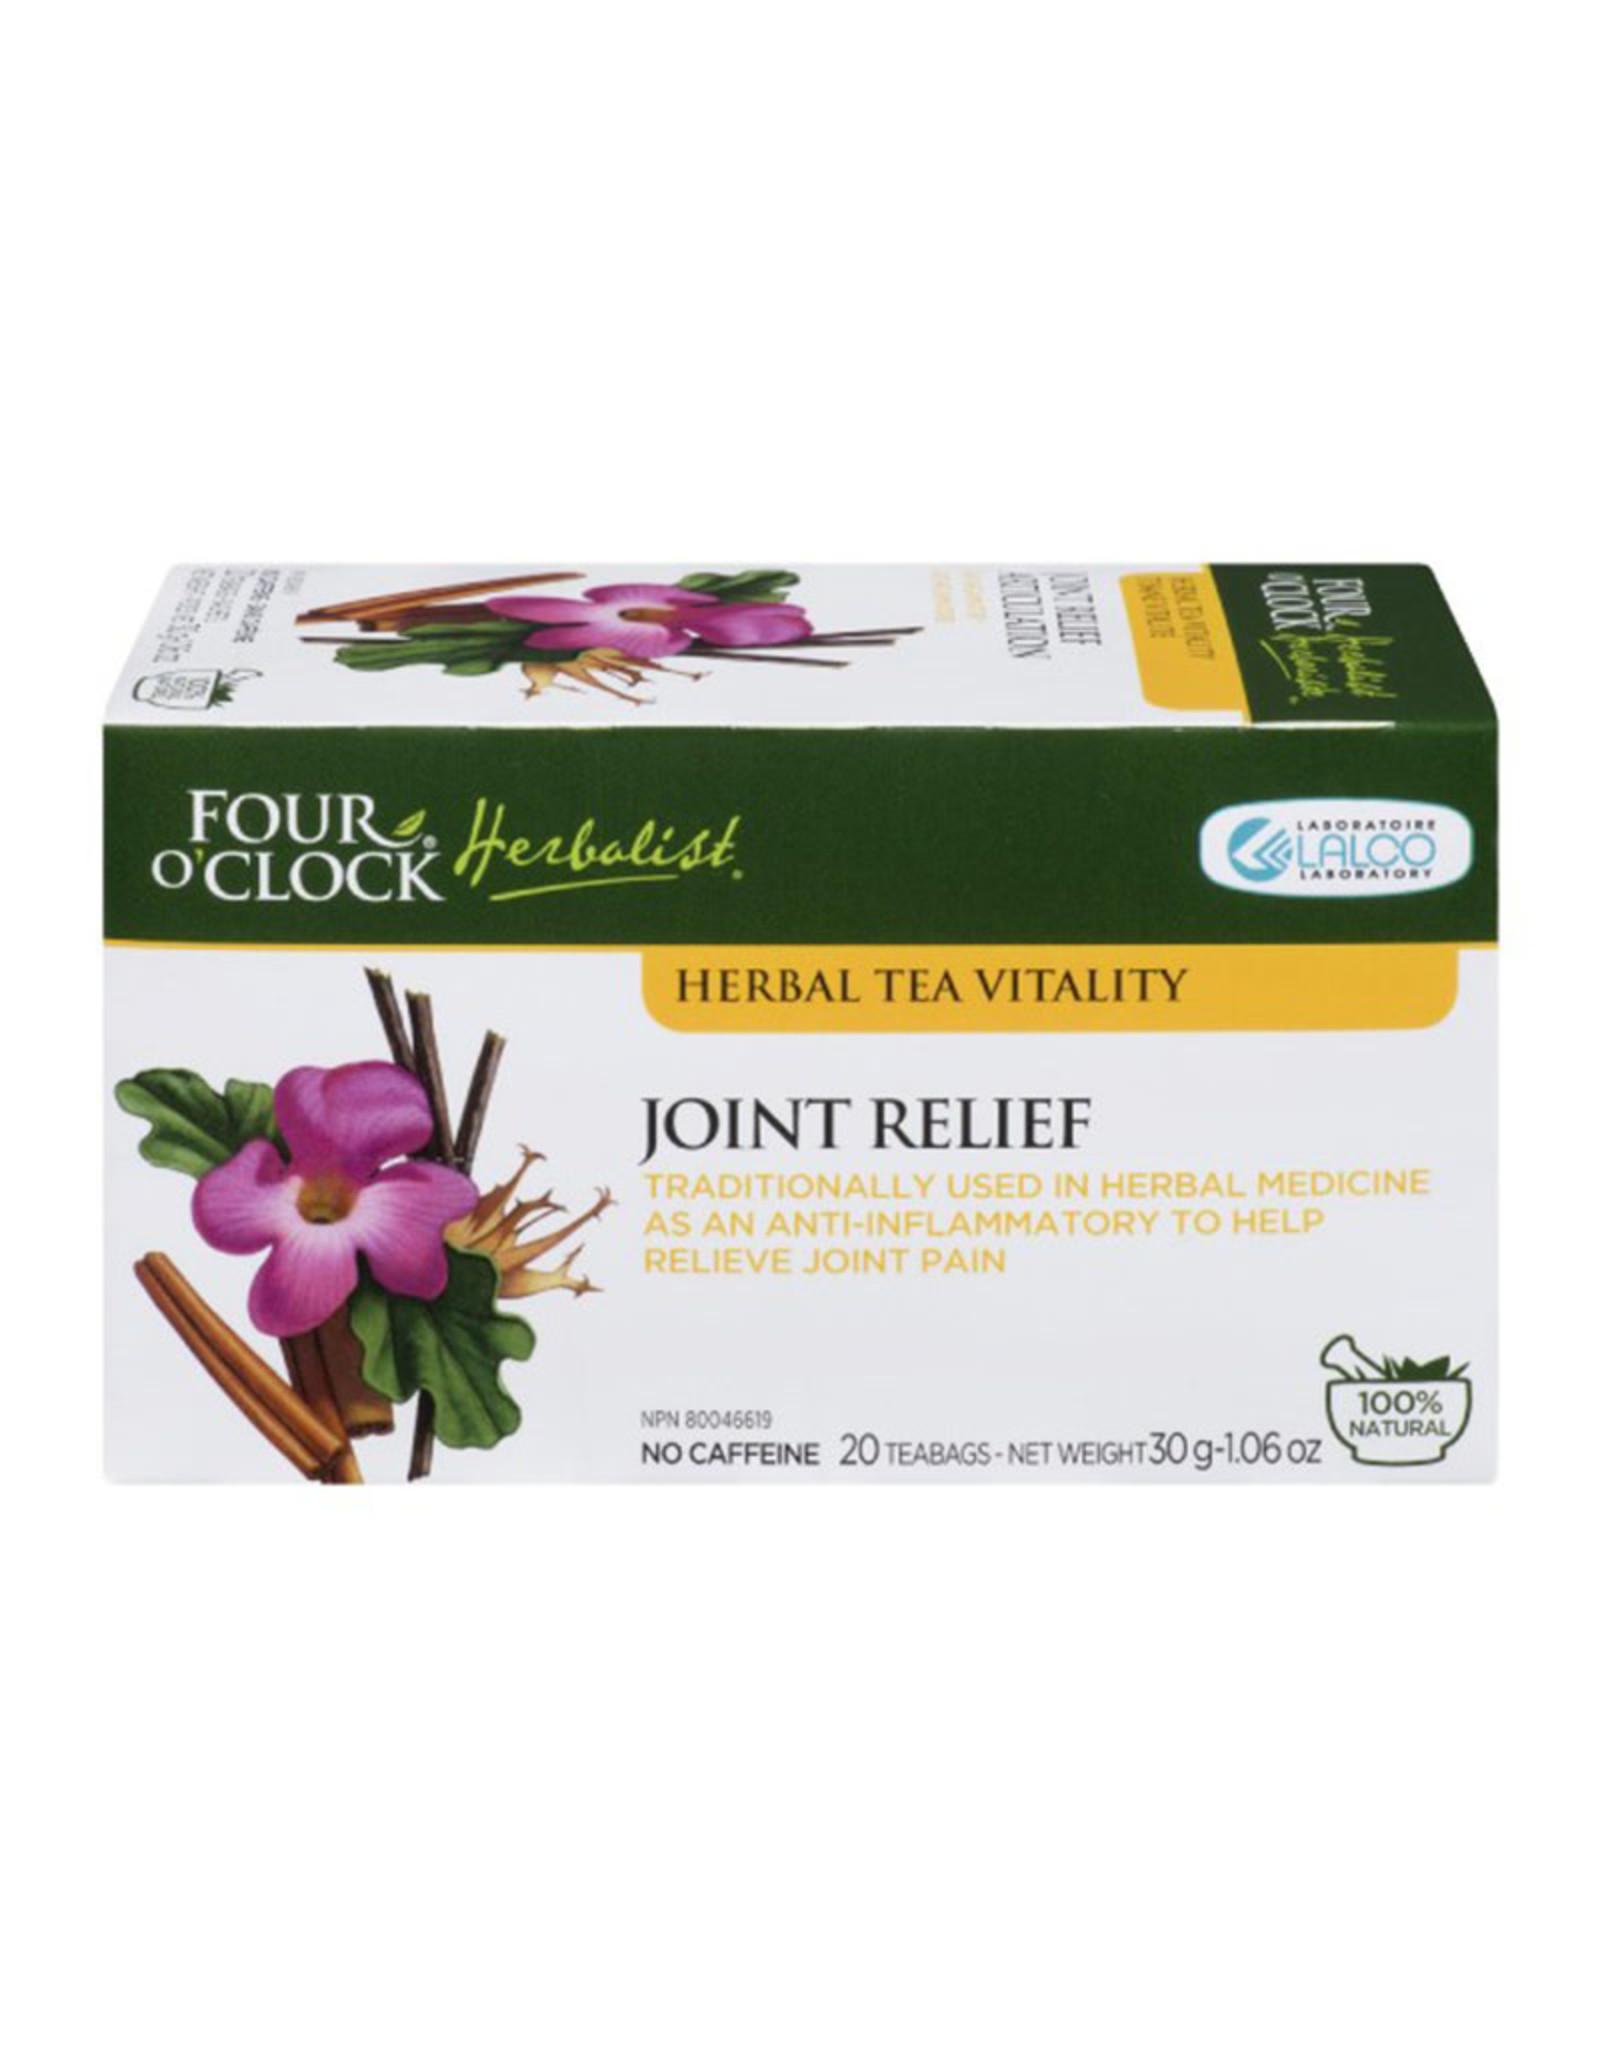 Four O'clock Four Oclock - Joint Relief Tea